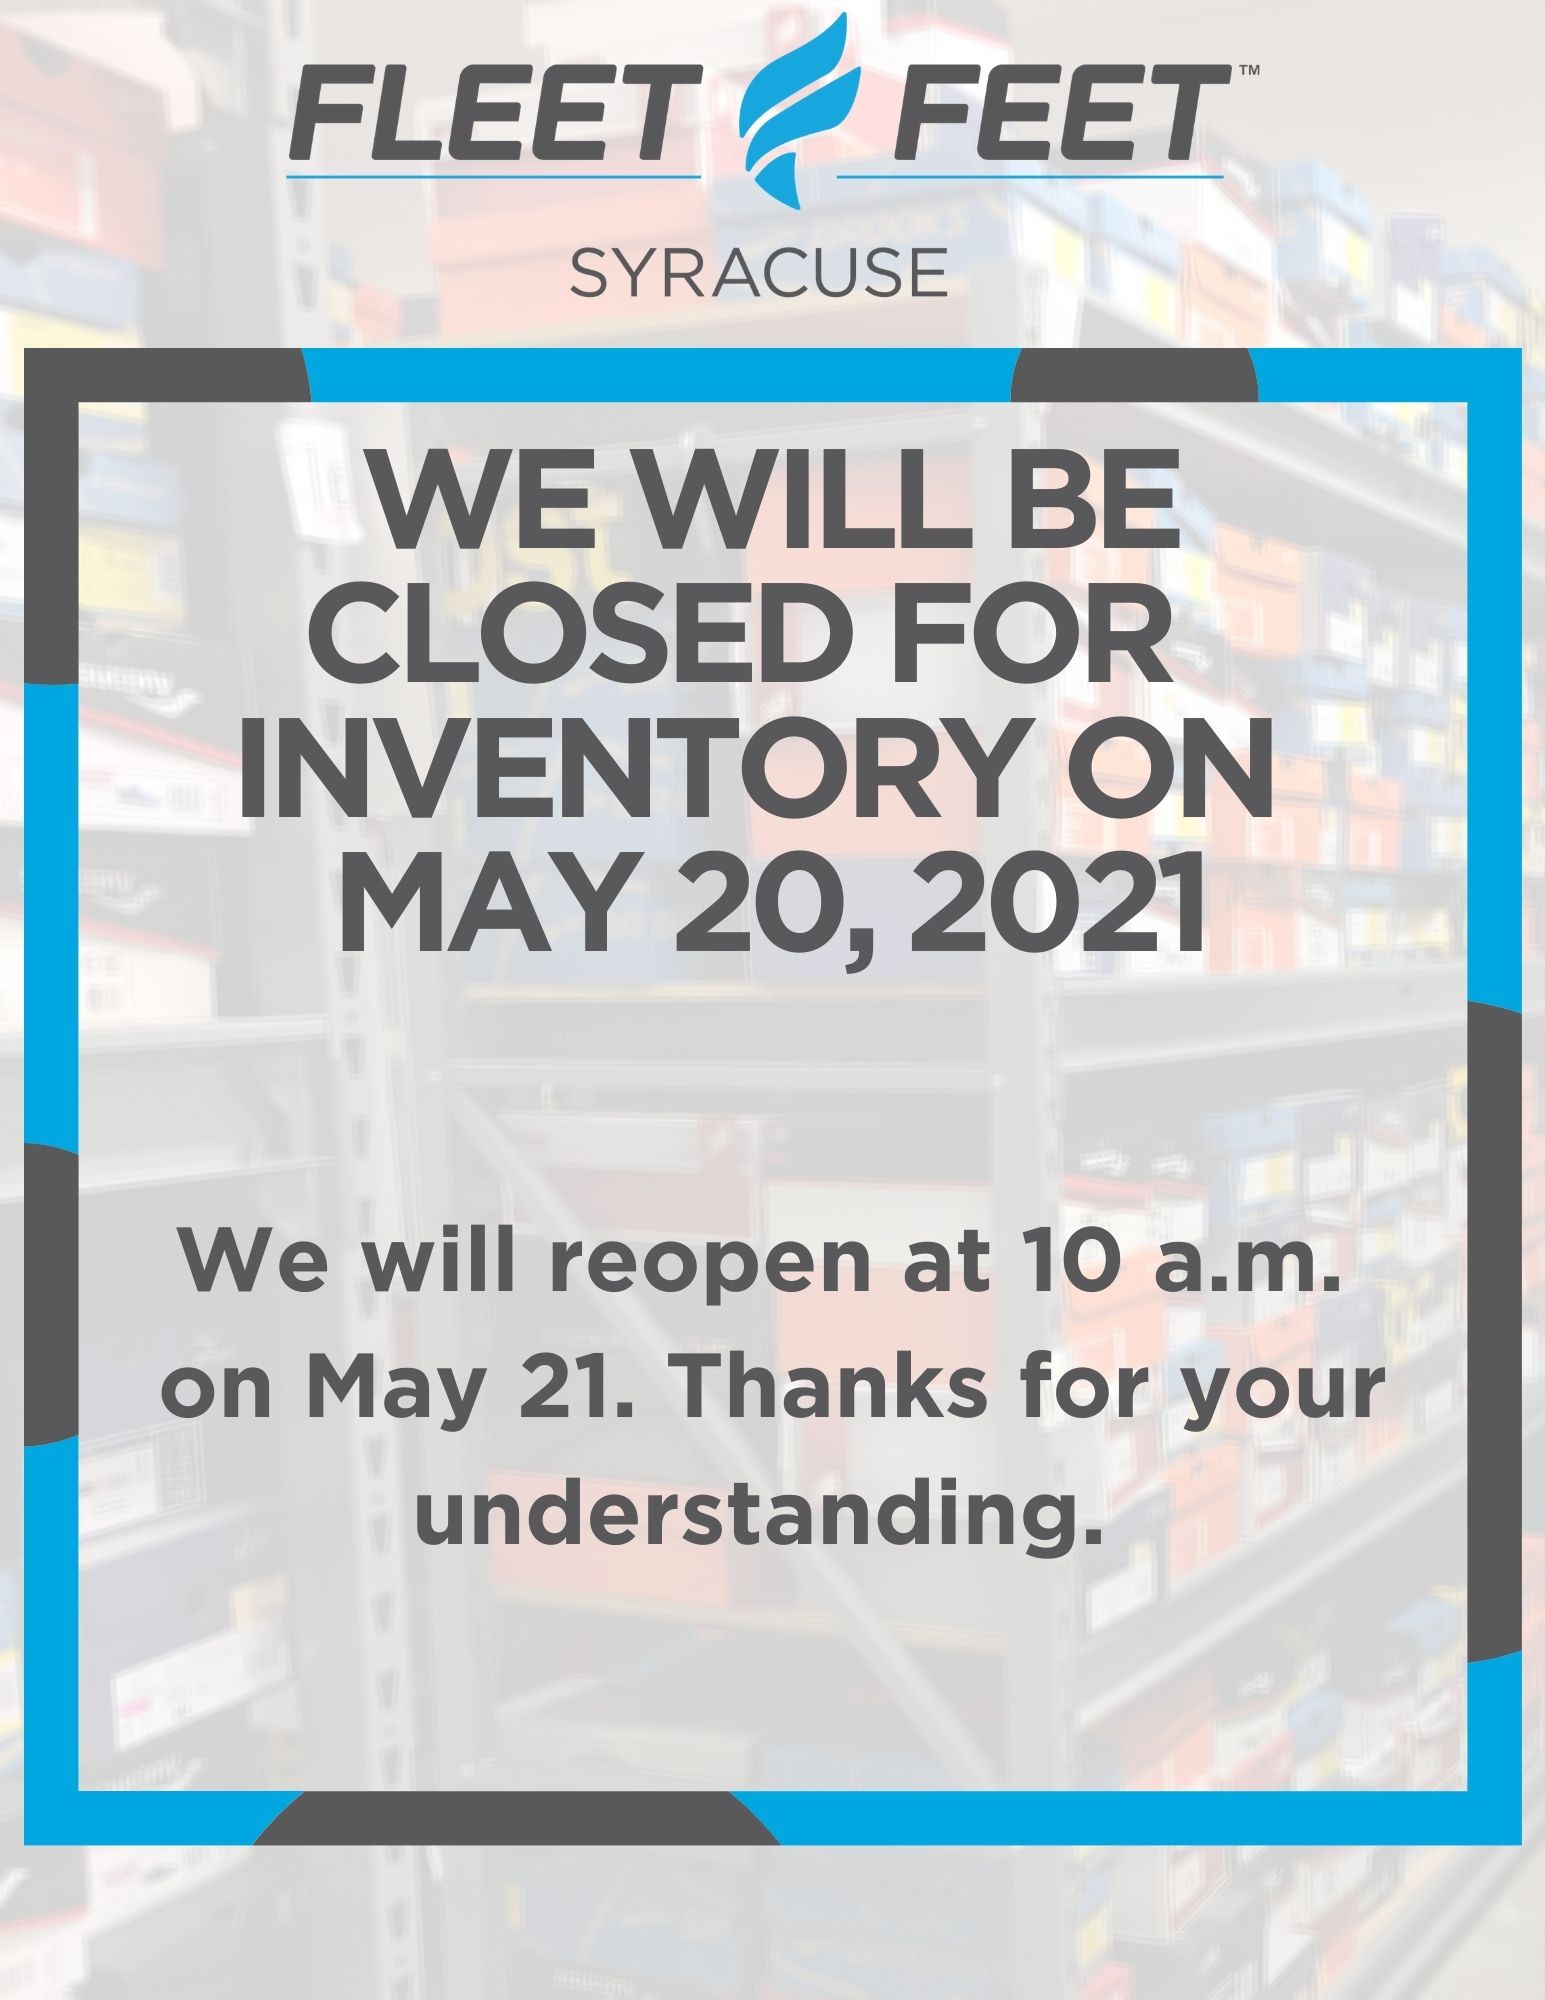 Fleet Feet Syracuse Closed on Thursday May 20th